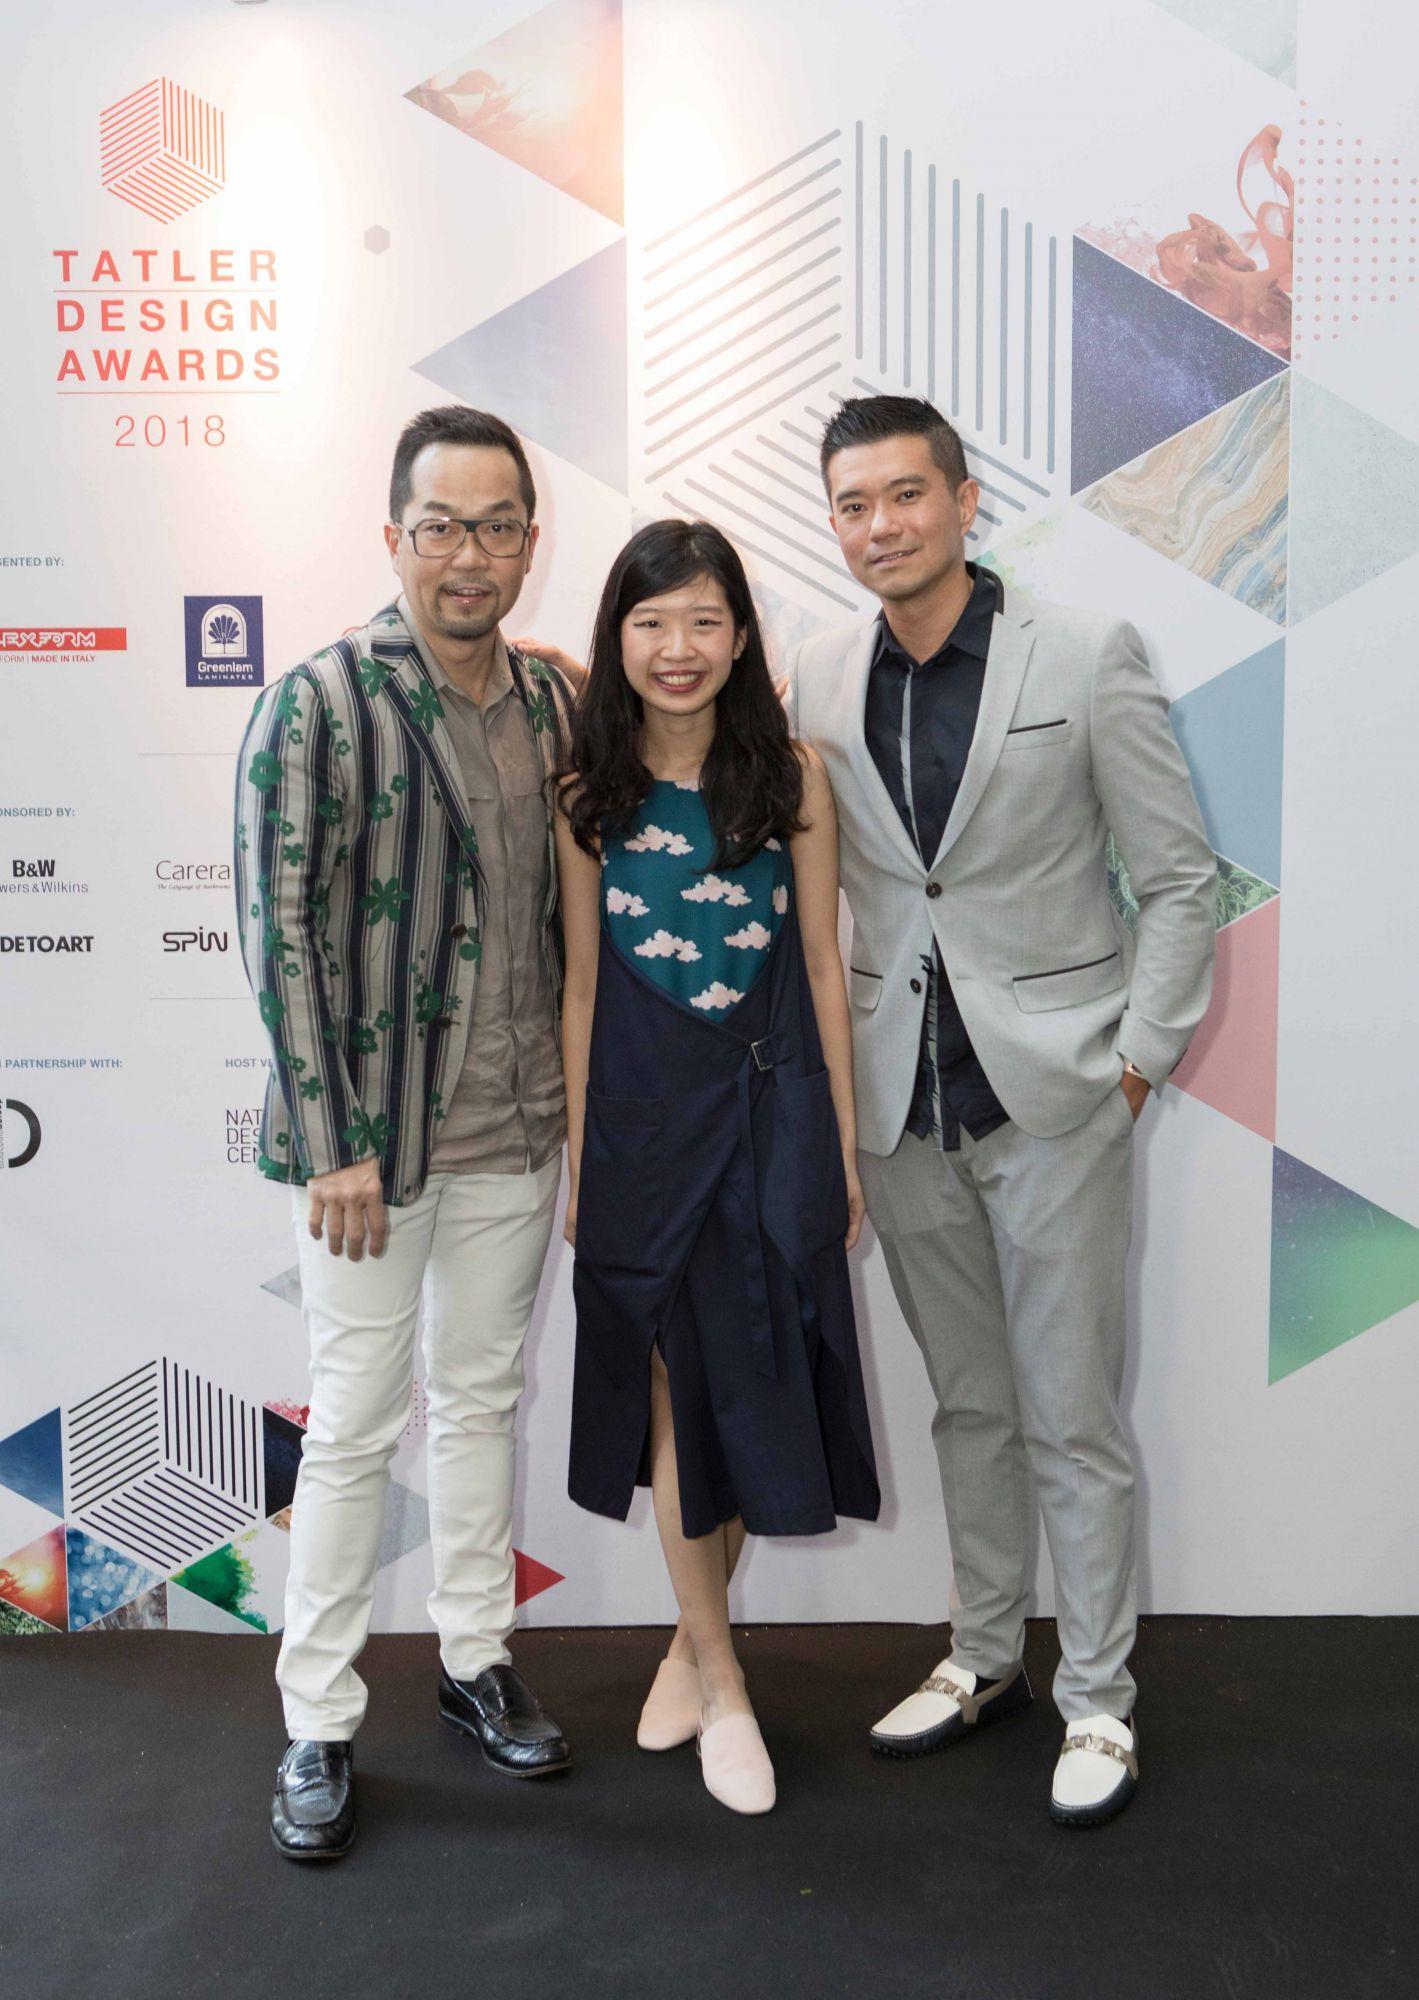 Michael Ong, Hong Xinying, Jeremy Tay